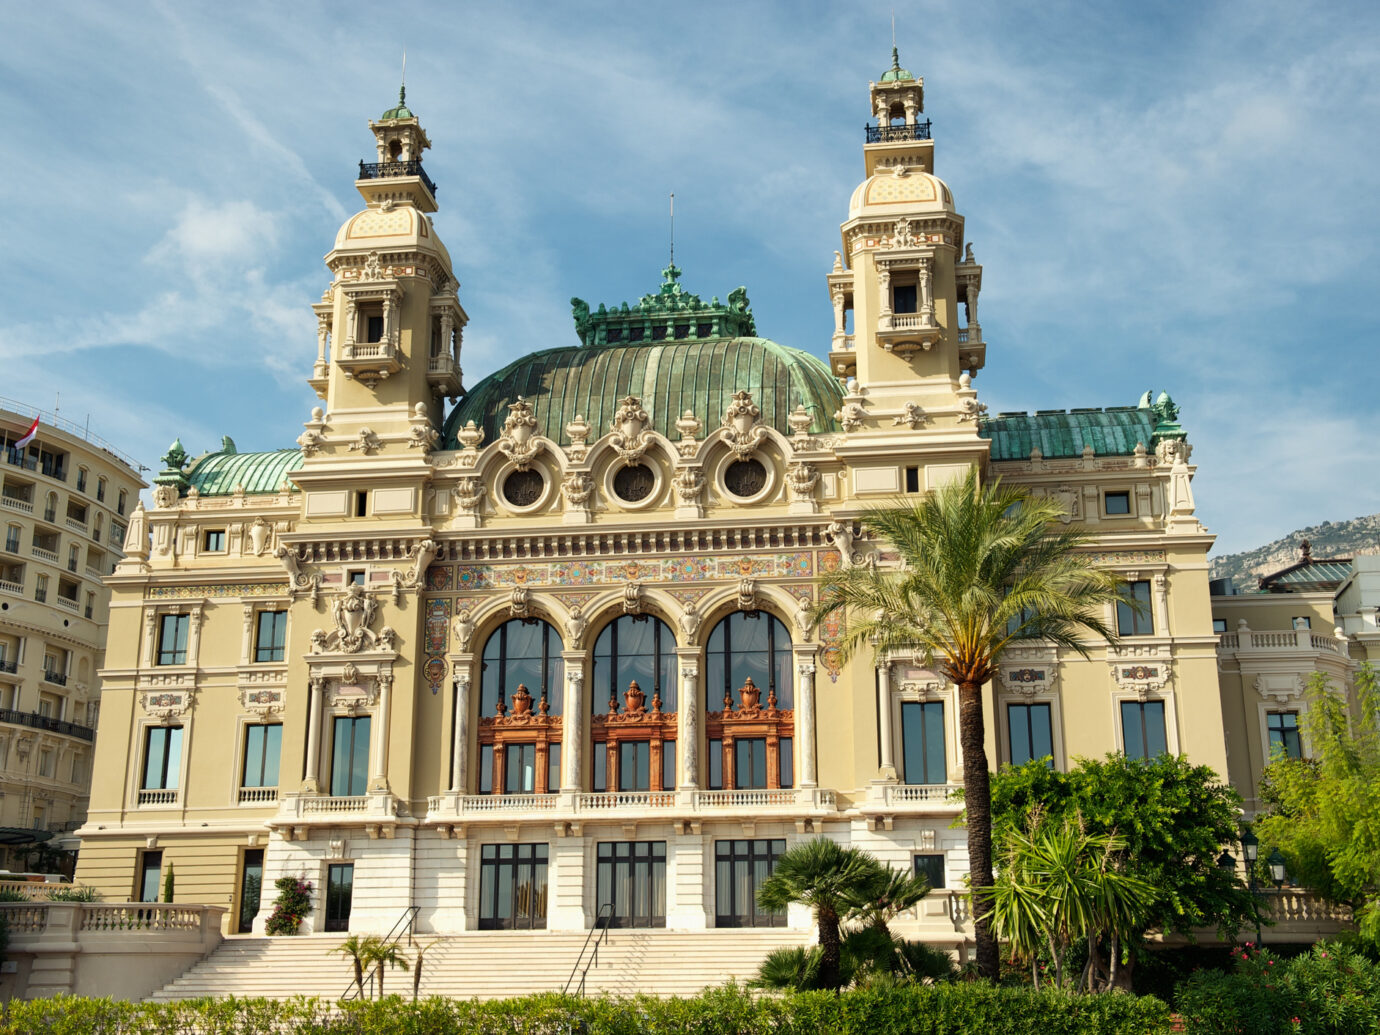 Casino of Montecarlo, Monaco. View from seaside.